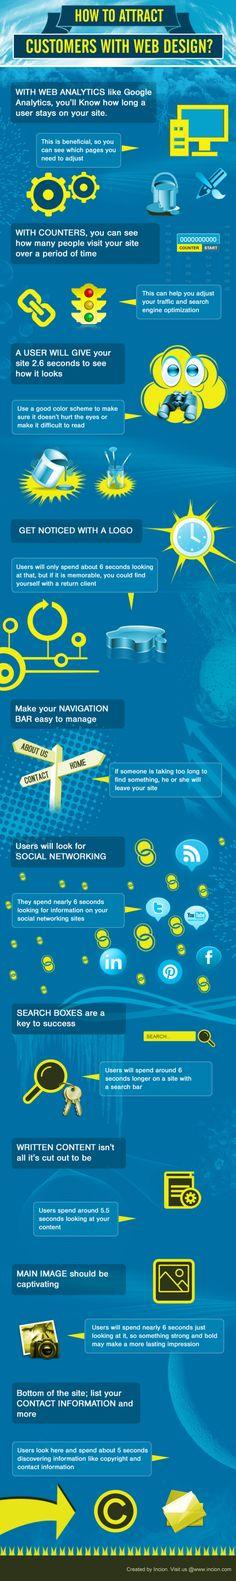 How to Attract Customers with Web Design? Infographic www.socialmediamamma.com